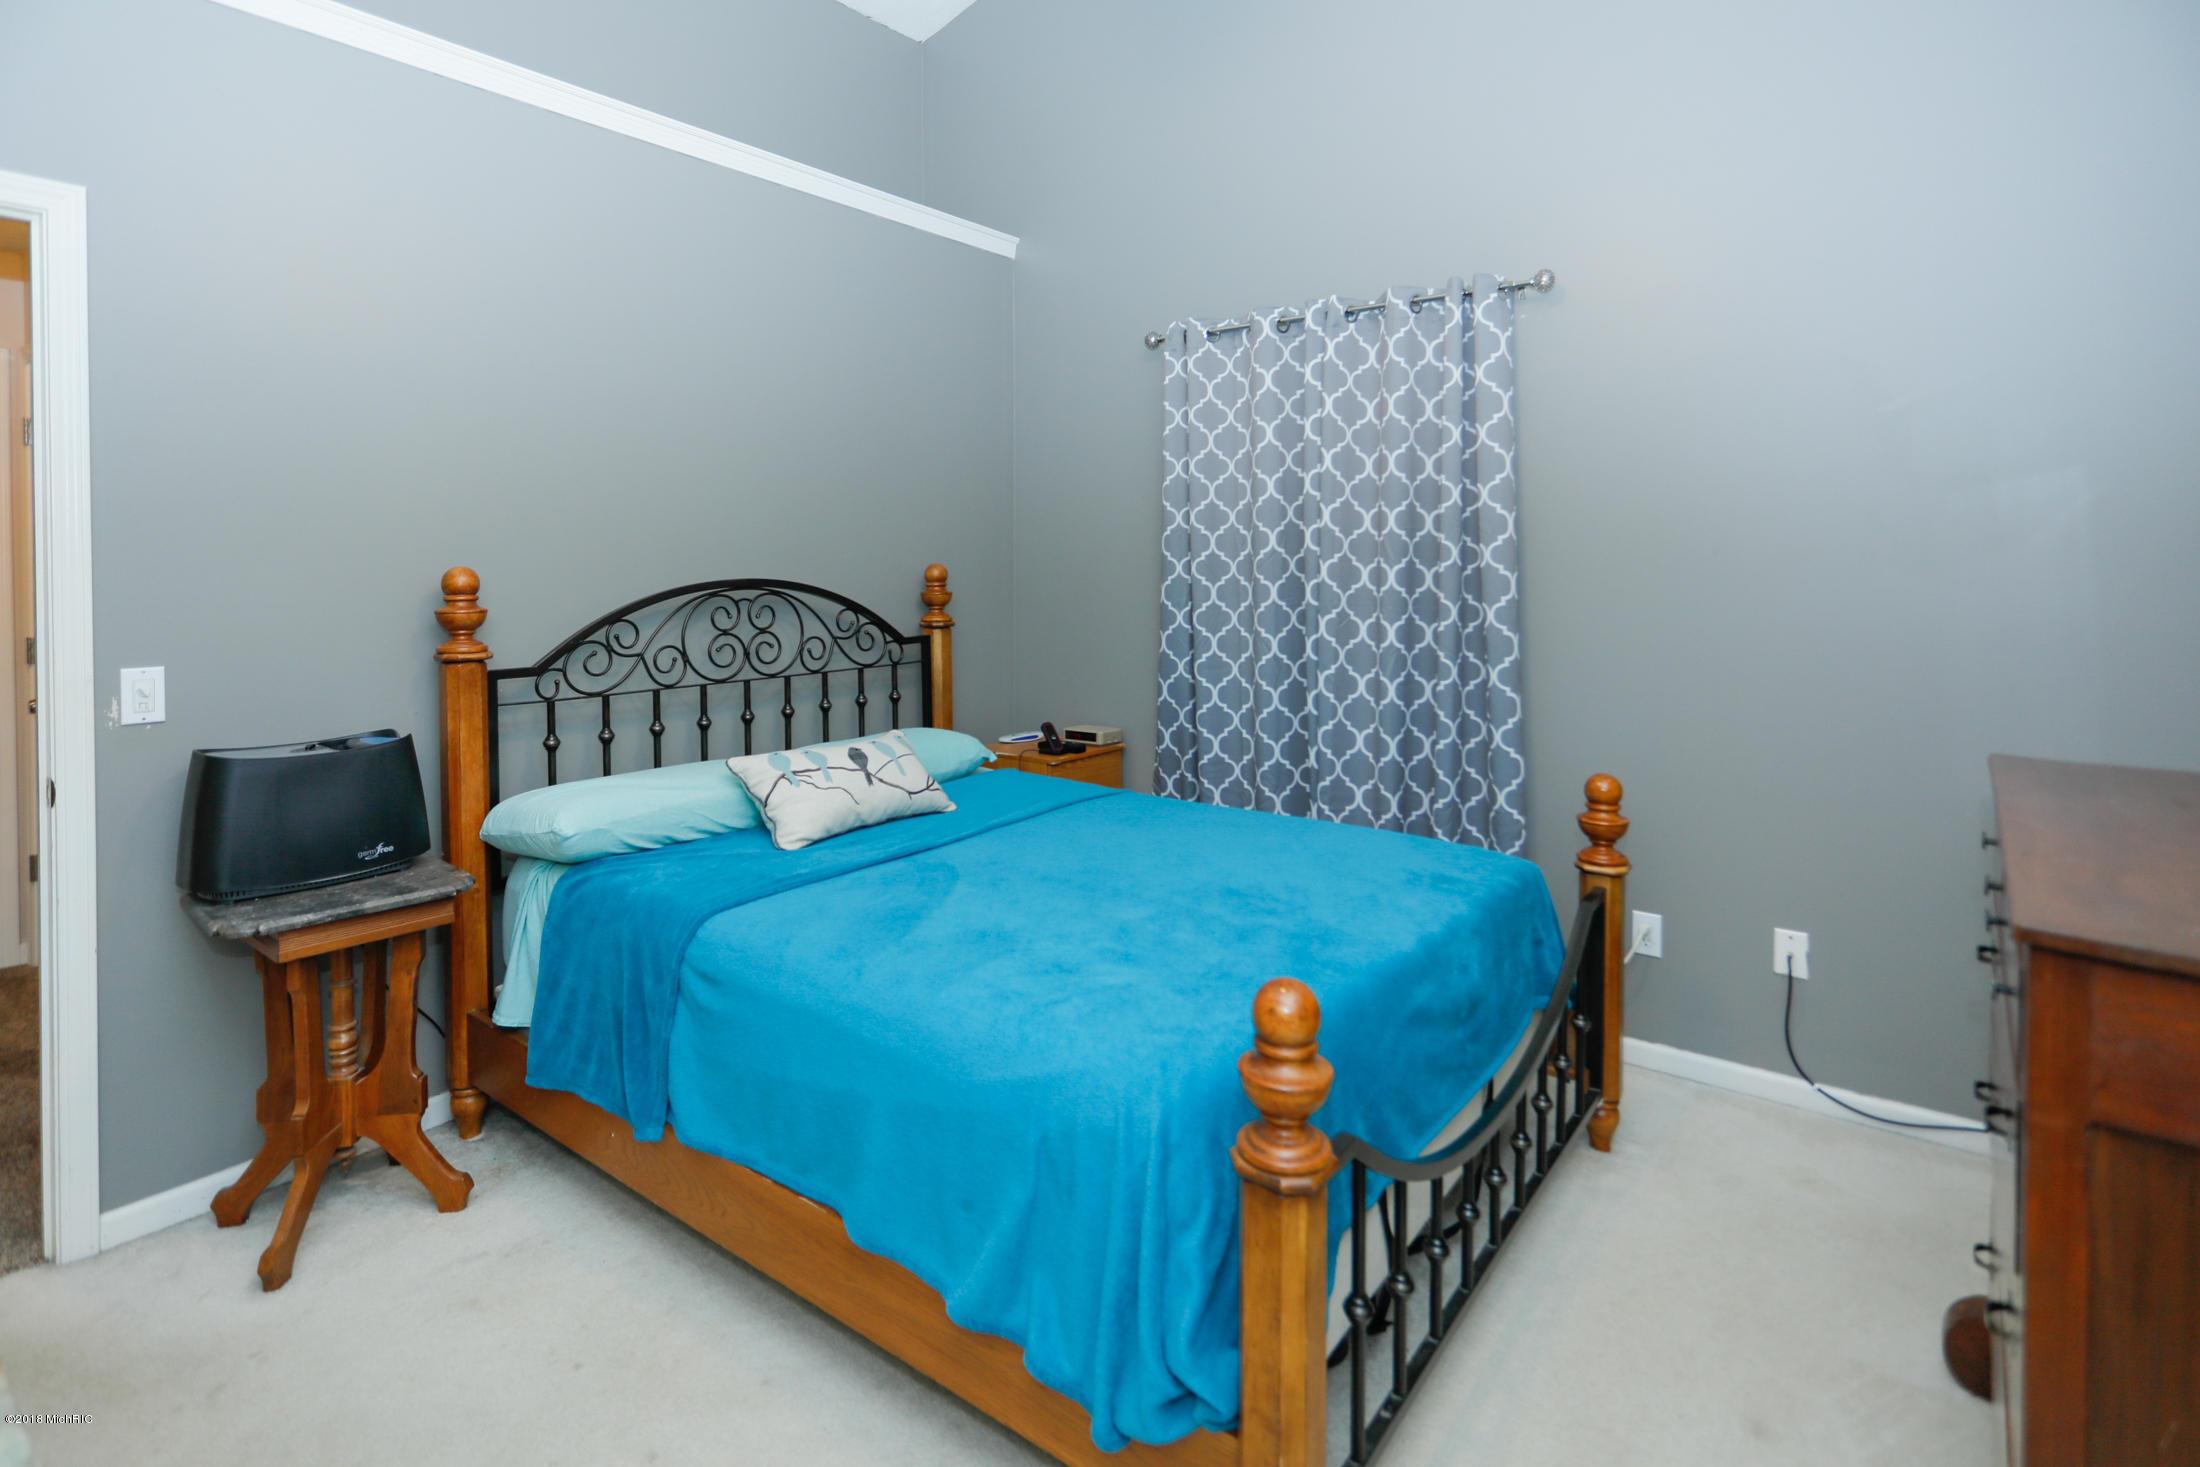 5955 Thistlewood Avenue, Scotts, MI 49088, MLS # 18049560   Jaqua ...